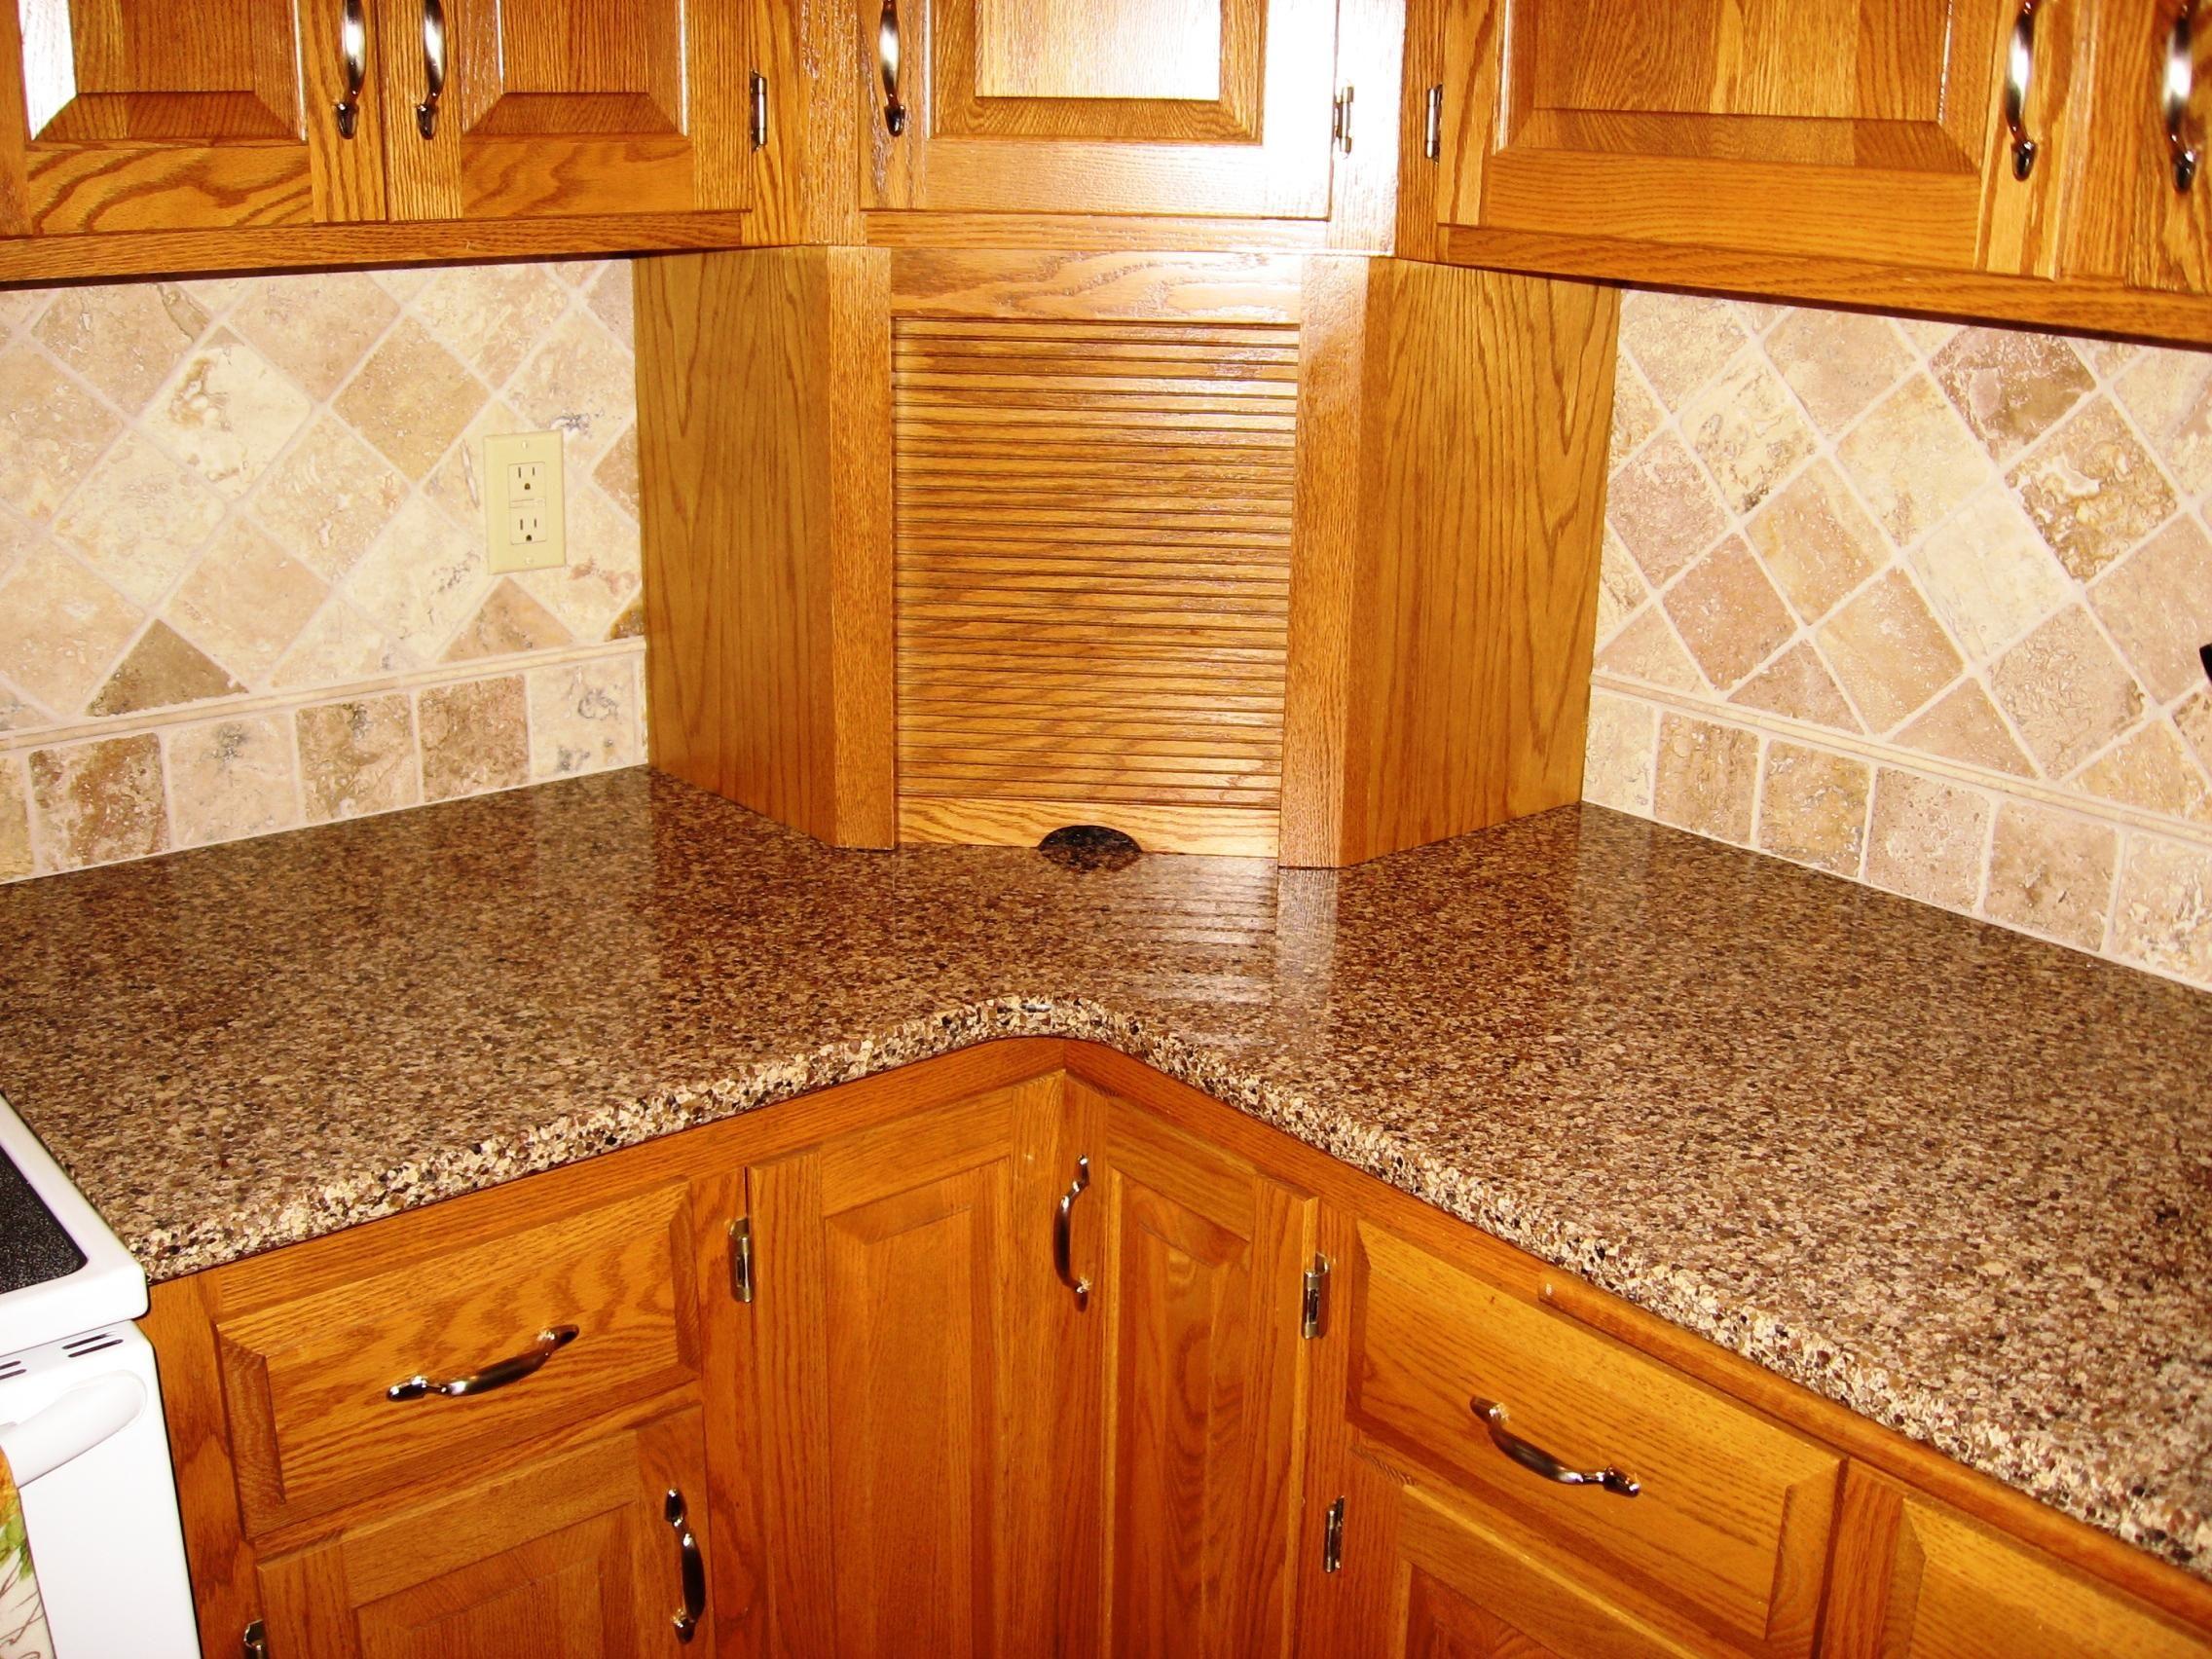 hardwood kitchen granite countertop caledonia granite counters in the kitchen Raw Silk Granite Kitchen Countertop